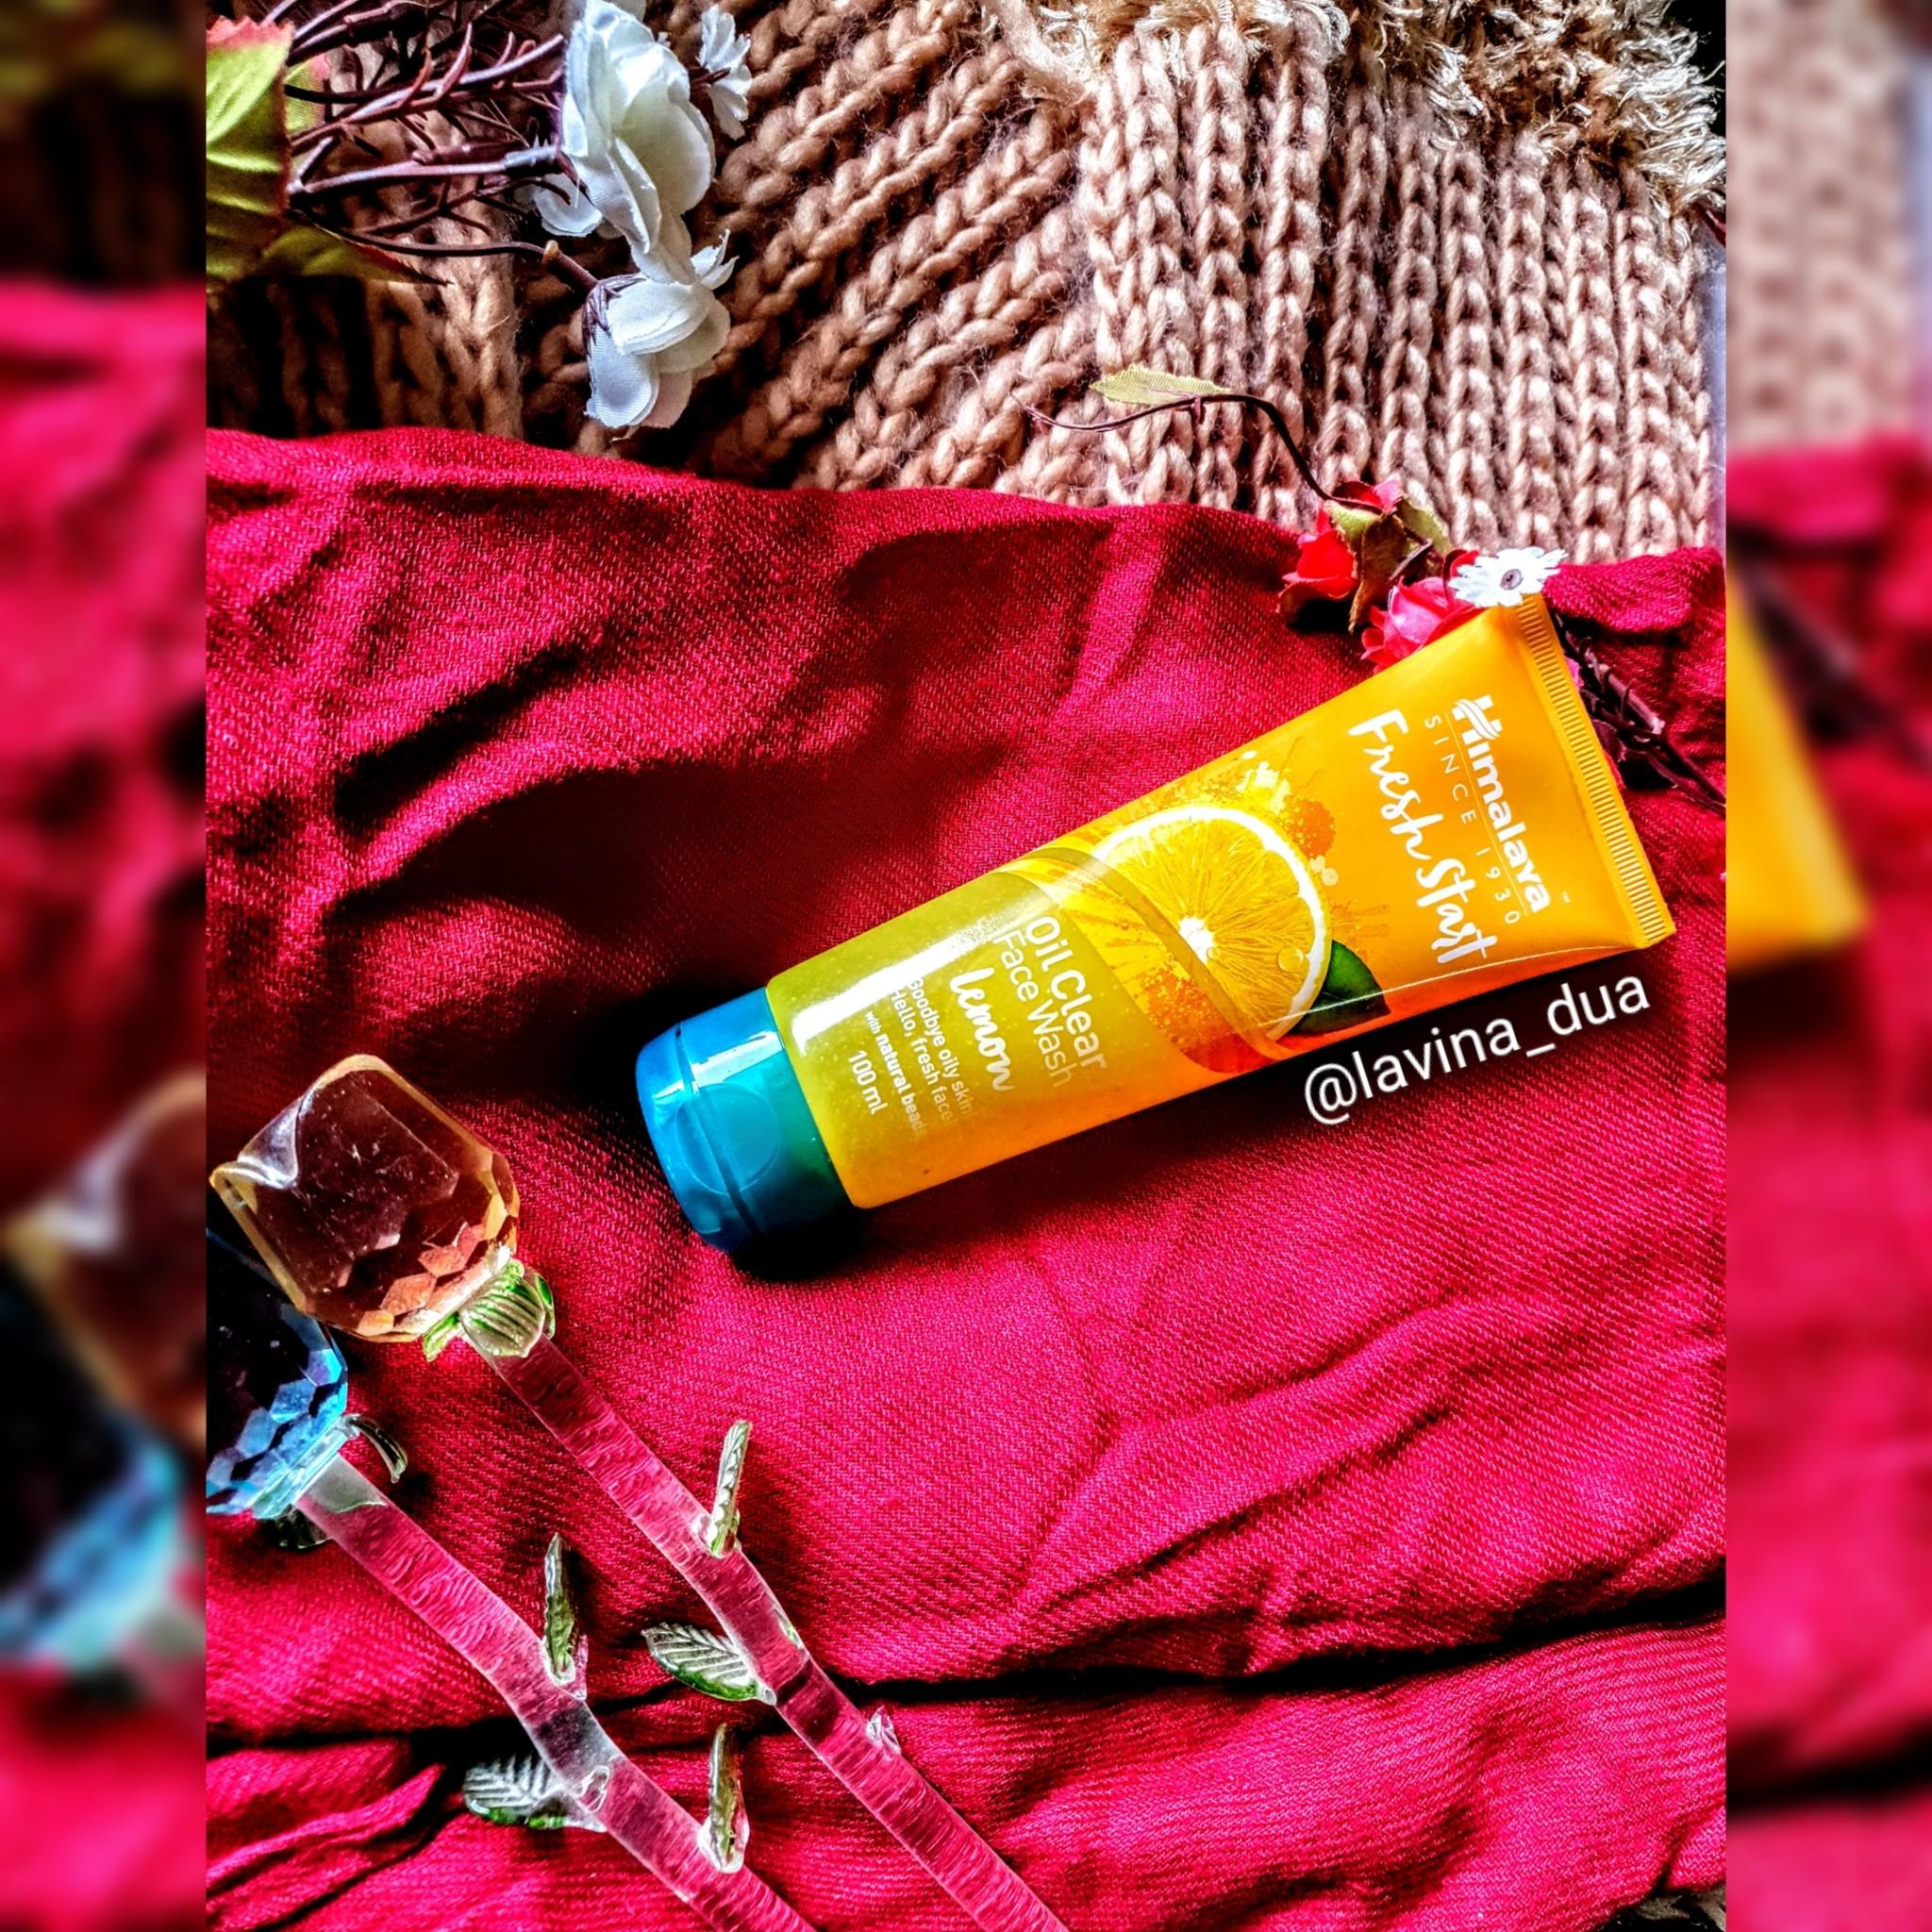 Himalaya Herbals Fresh Start Oil Clear Lemon Face Wash-Favourite Brand; Favorite Product-By lavina_dua